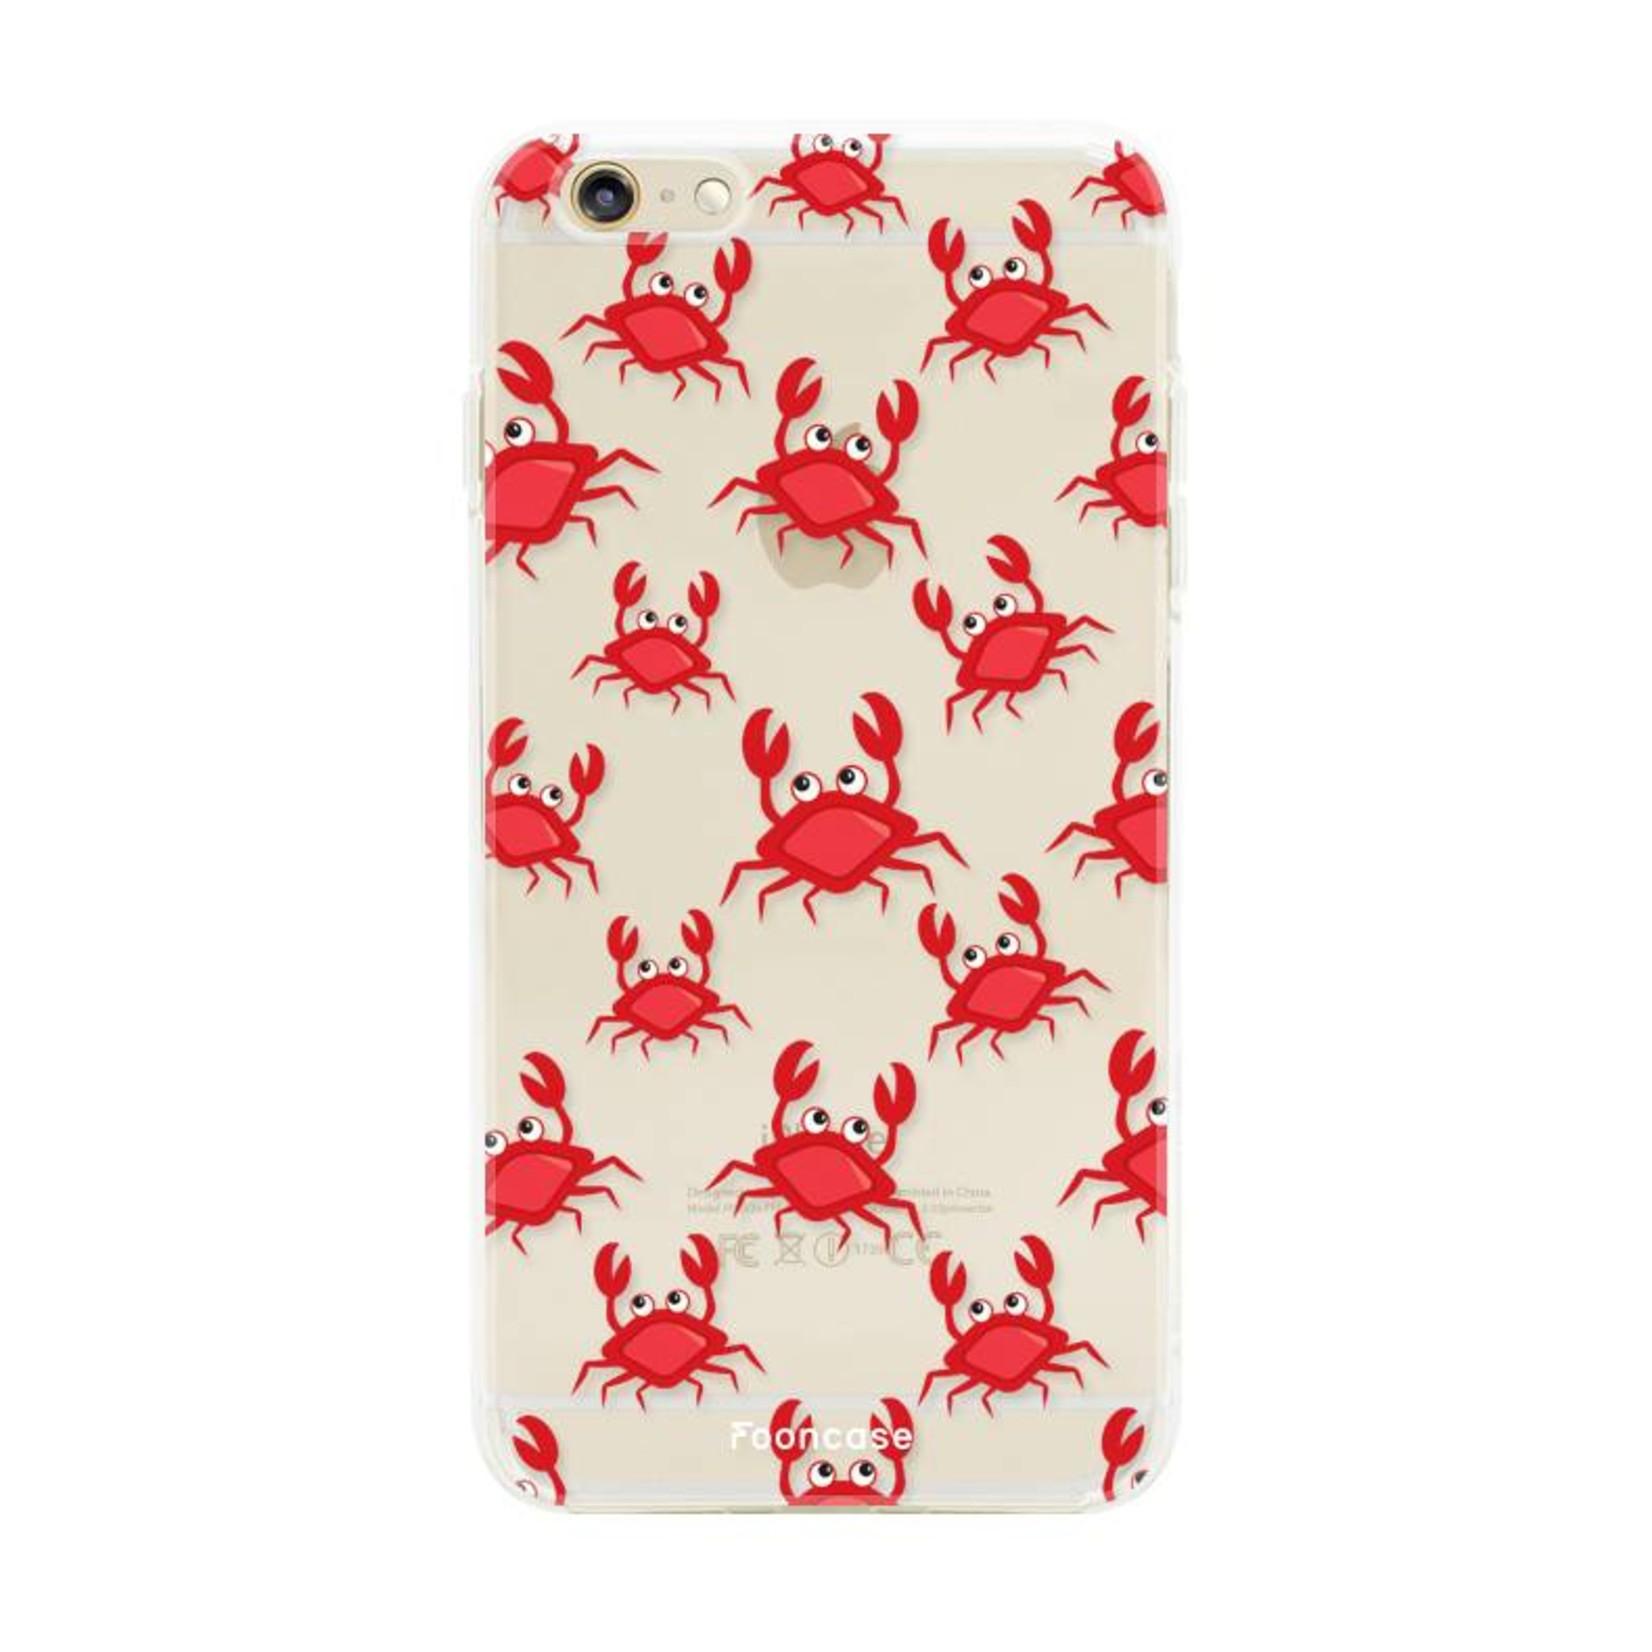 FOONCASE Iphone 6 Plus Handyhülle - Krabben